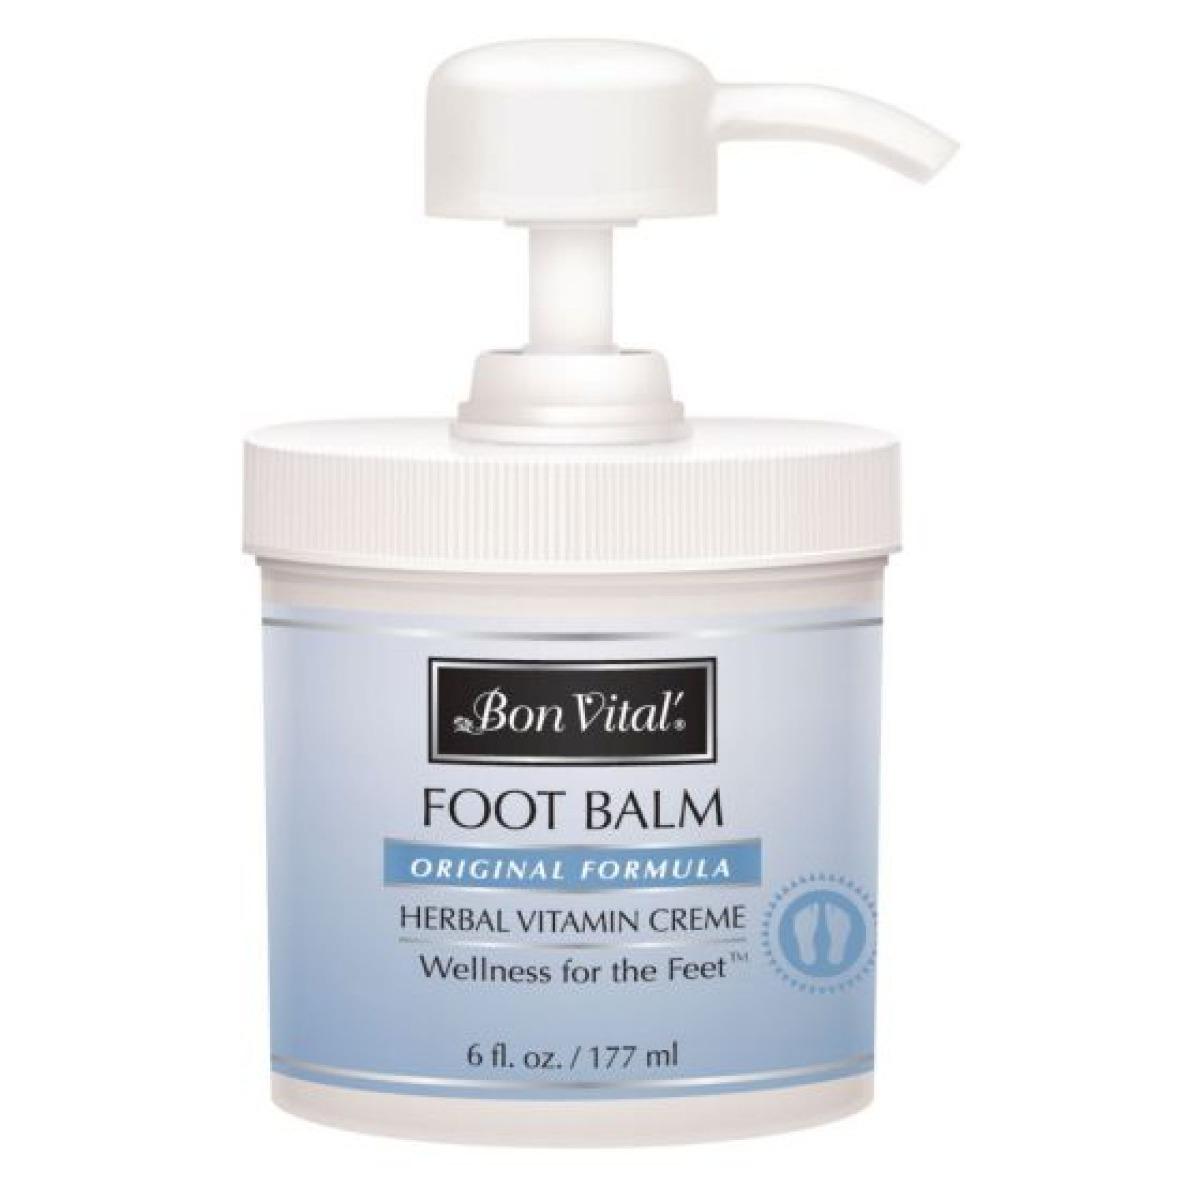 Bon Vital Foot Balm, 6 oz.